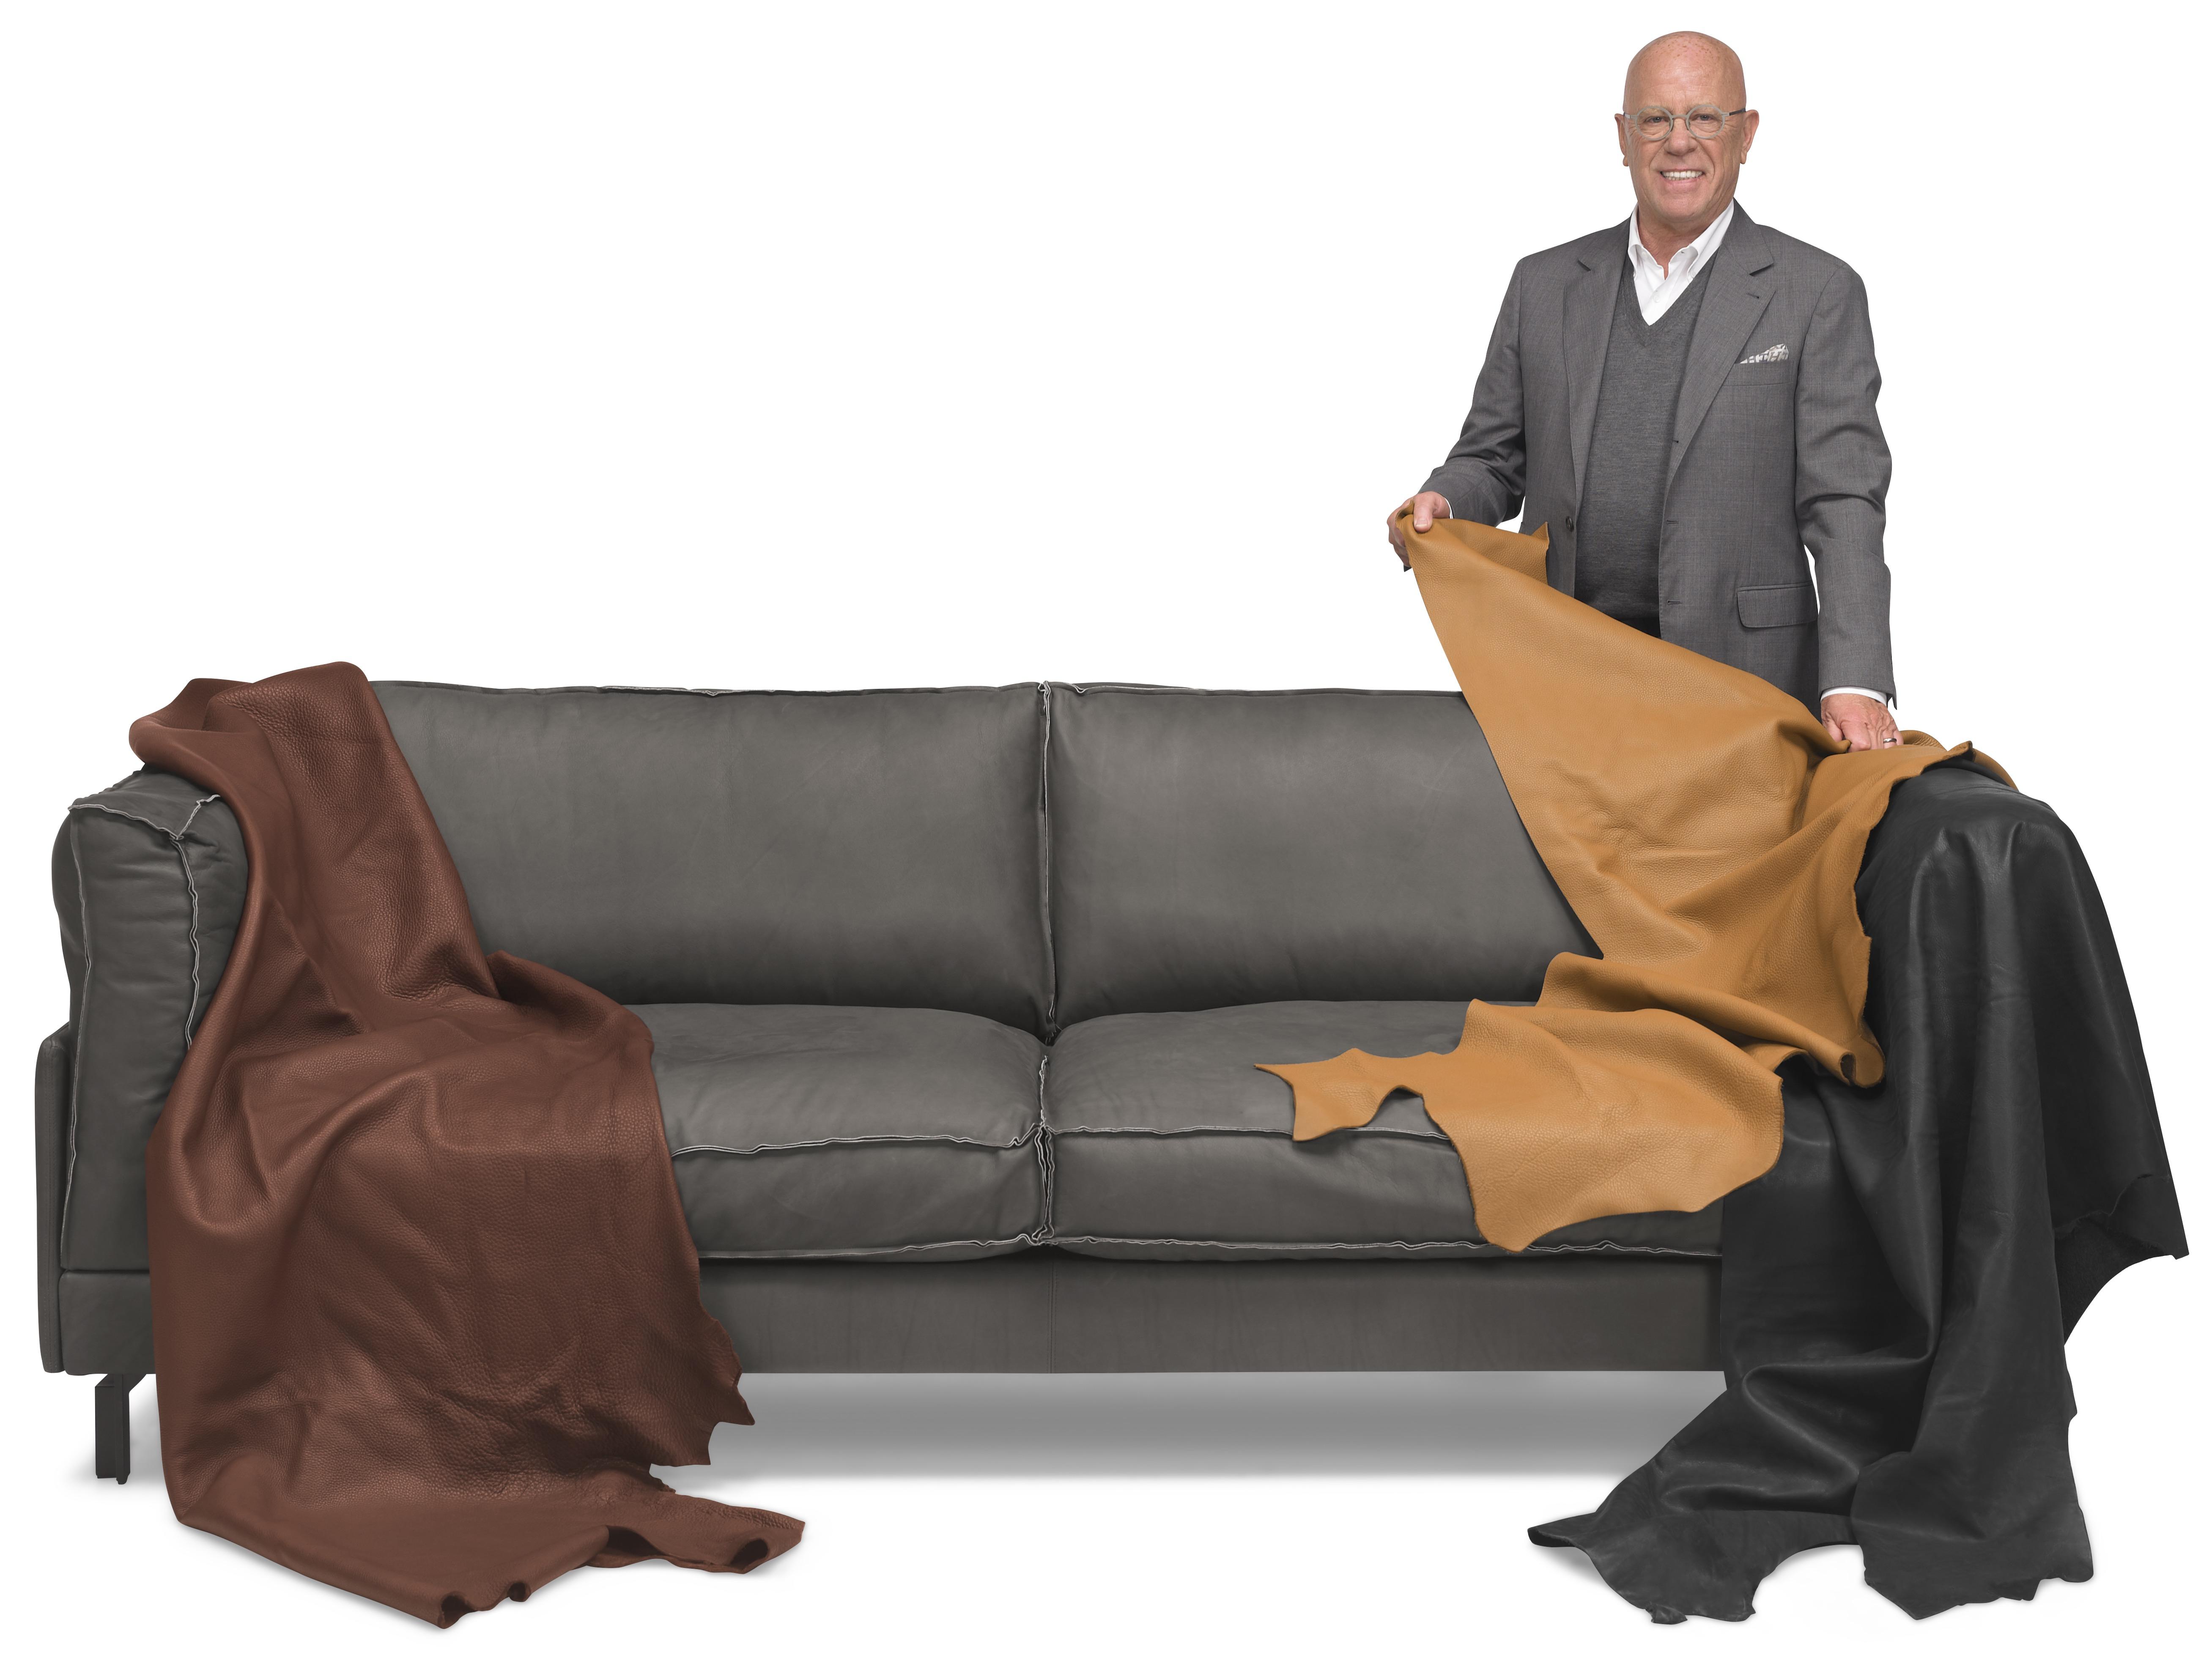 Das Hetkamp-Sofa